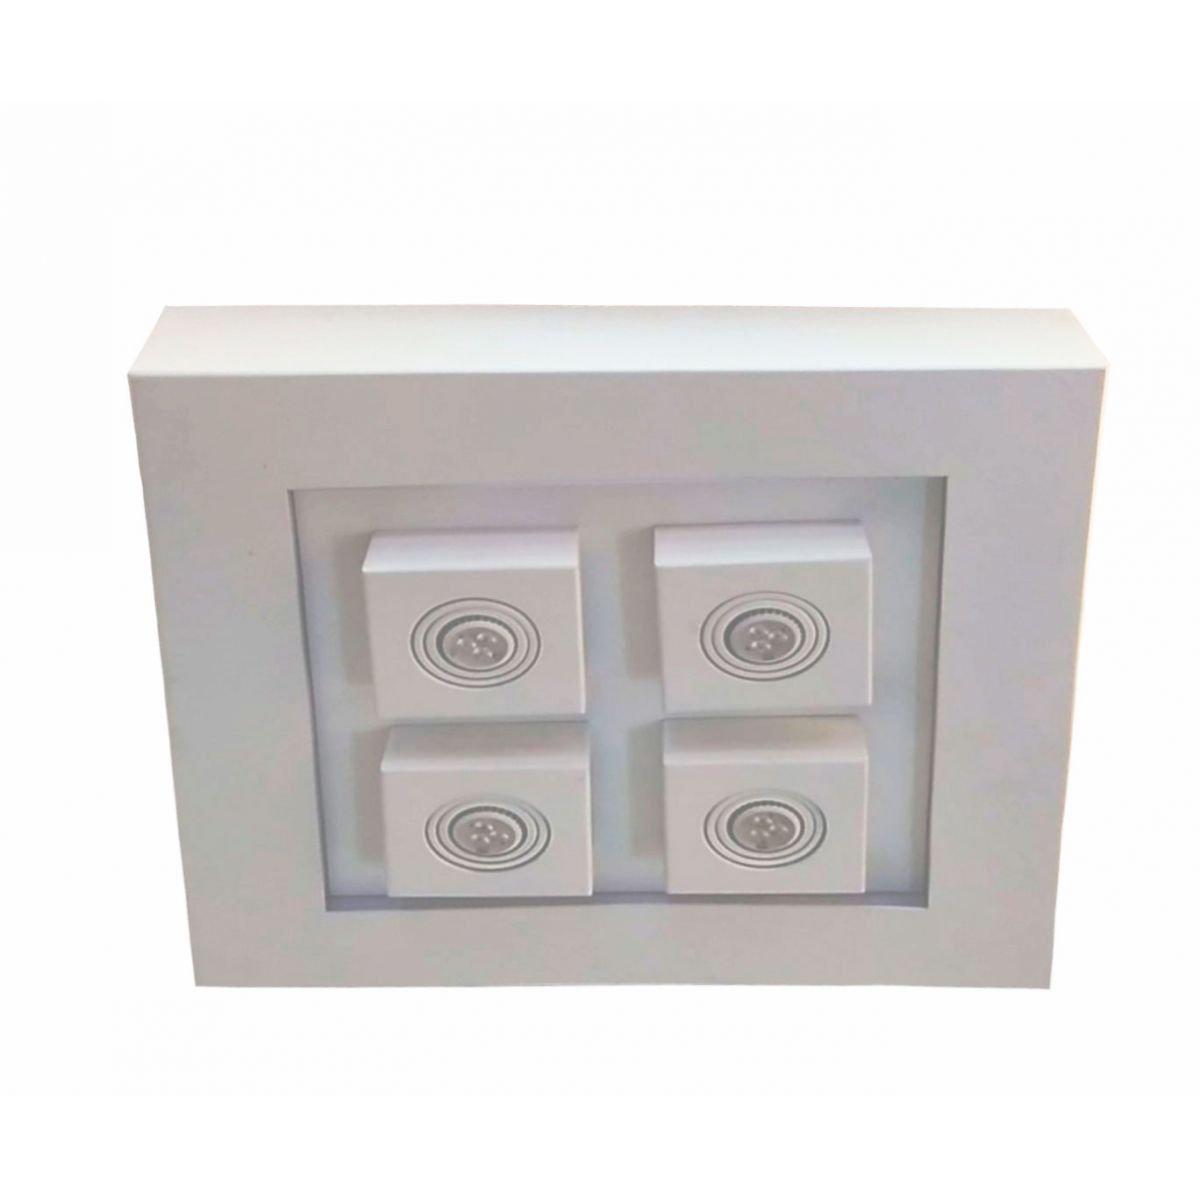 Plafon Luz Indireta Sobrepor Branco 8E27 + 4GU10 50X50CM 4110 Piuluce